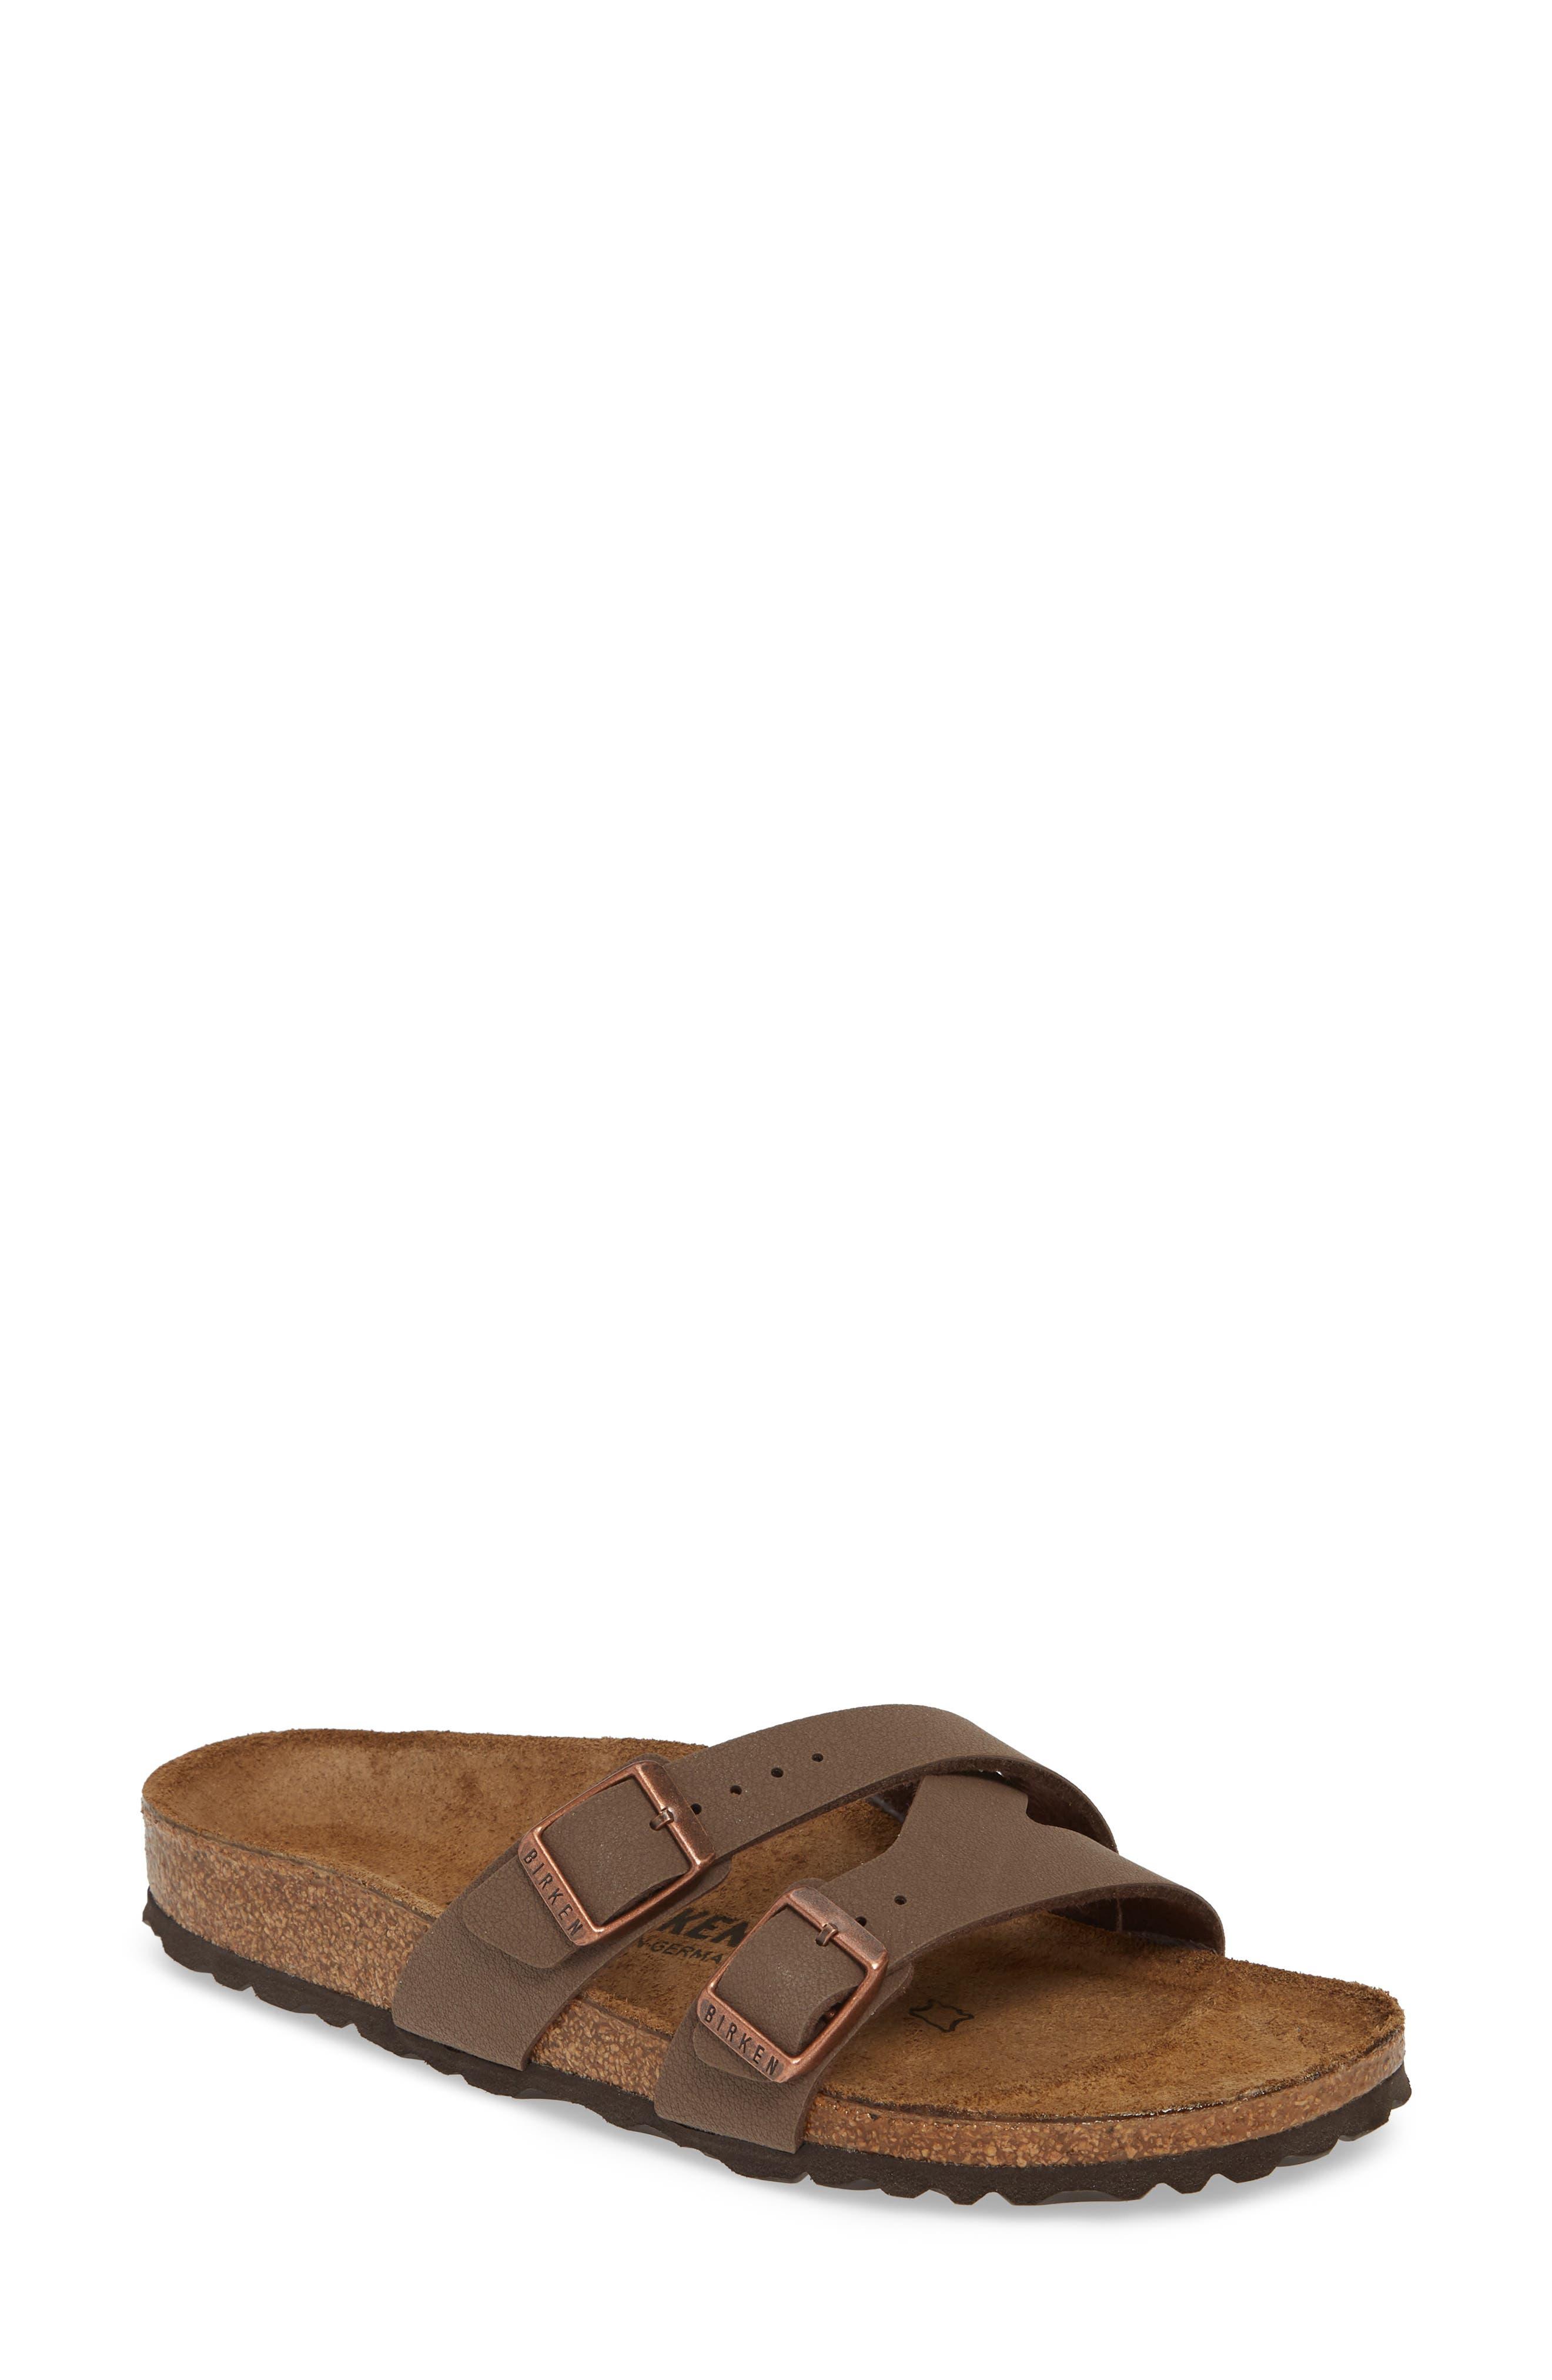 Birkenstock Yao Slide Sandal, Brown